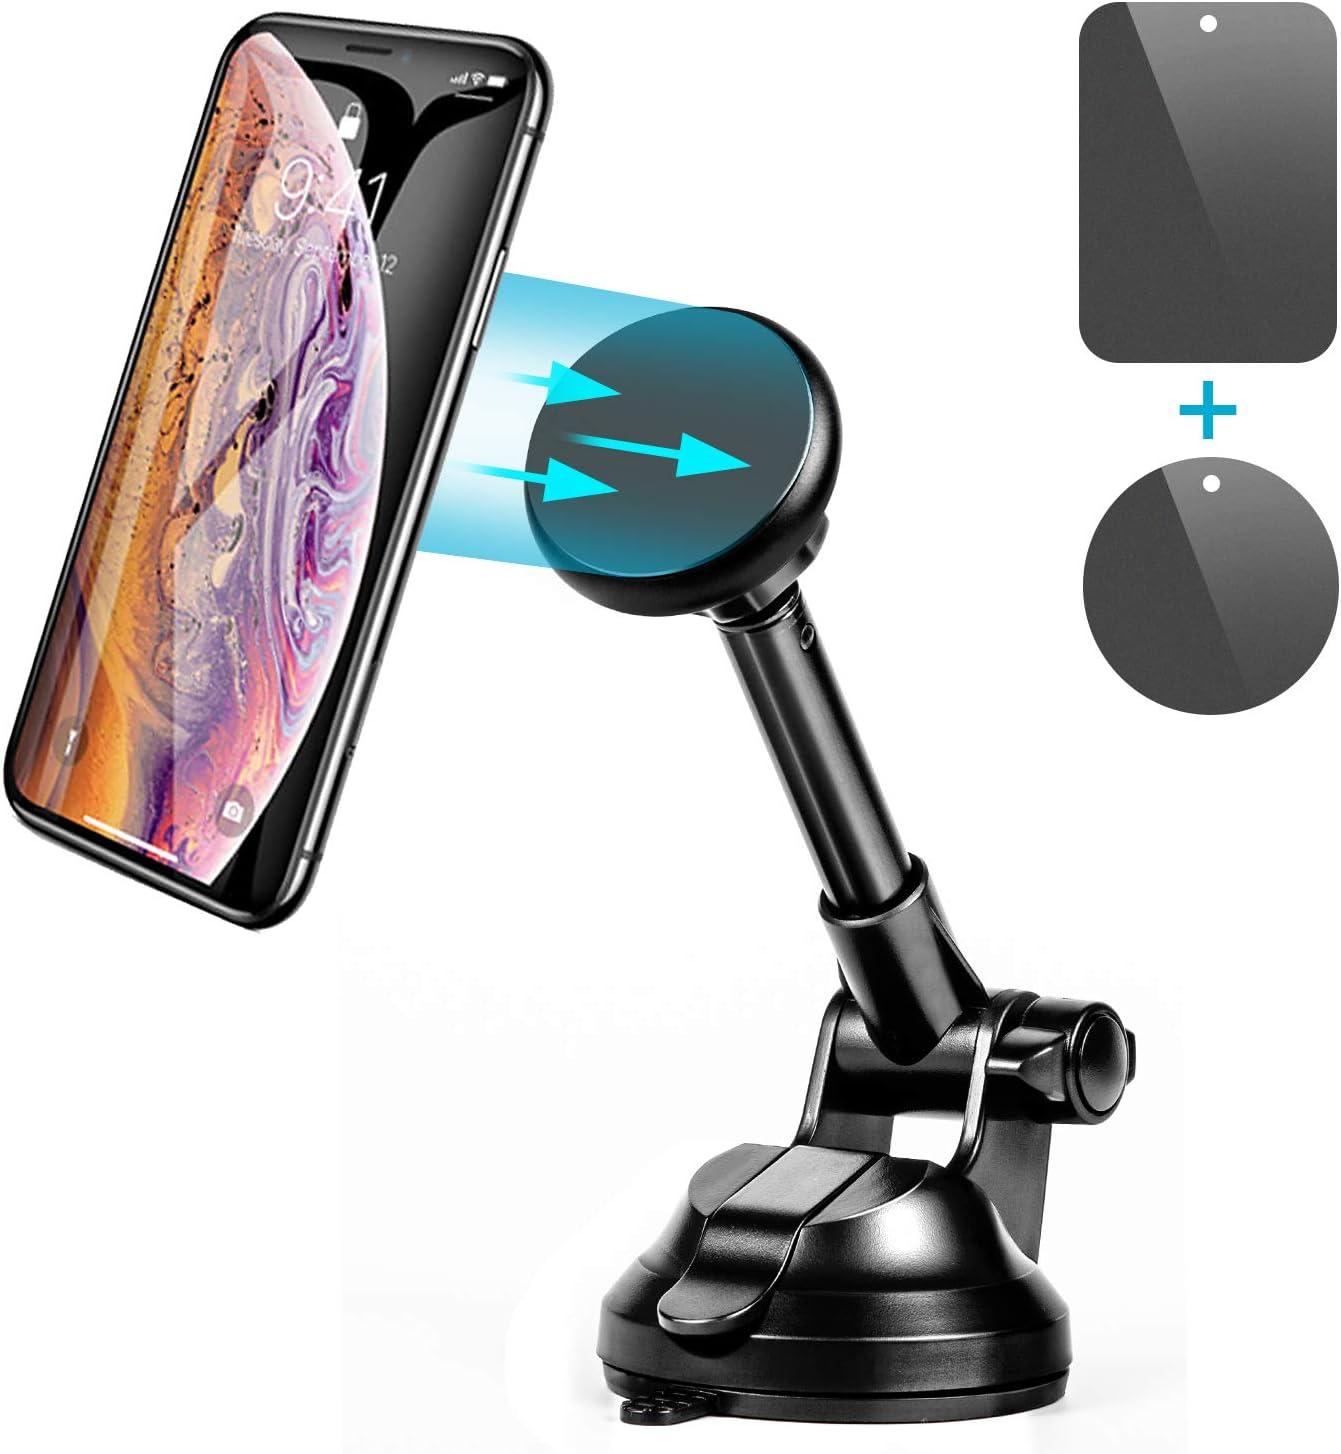 Car Phone Mount Cell Phone Holder Magnet Phone Holder for Car Dashboard Desk Stand for Smartphones Retractable Magnetic Car Mount